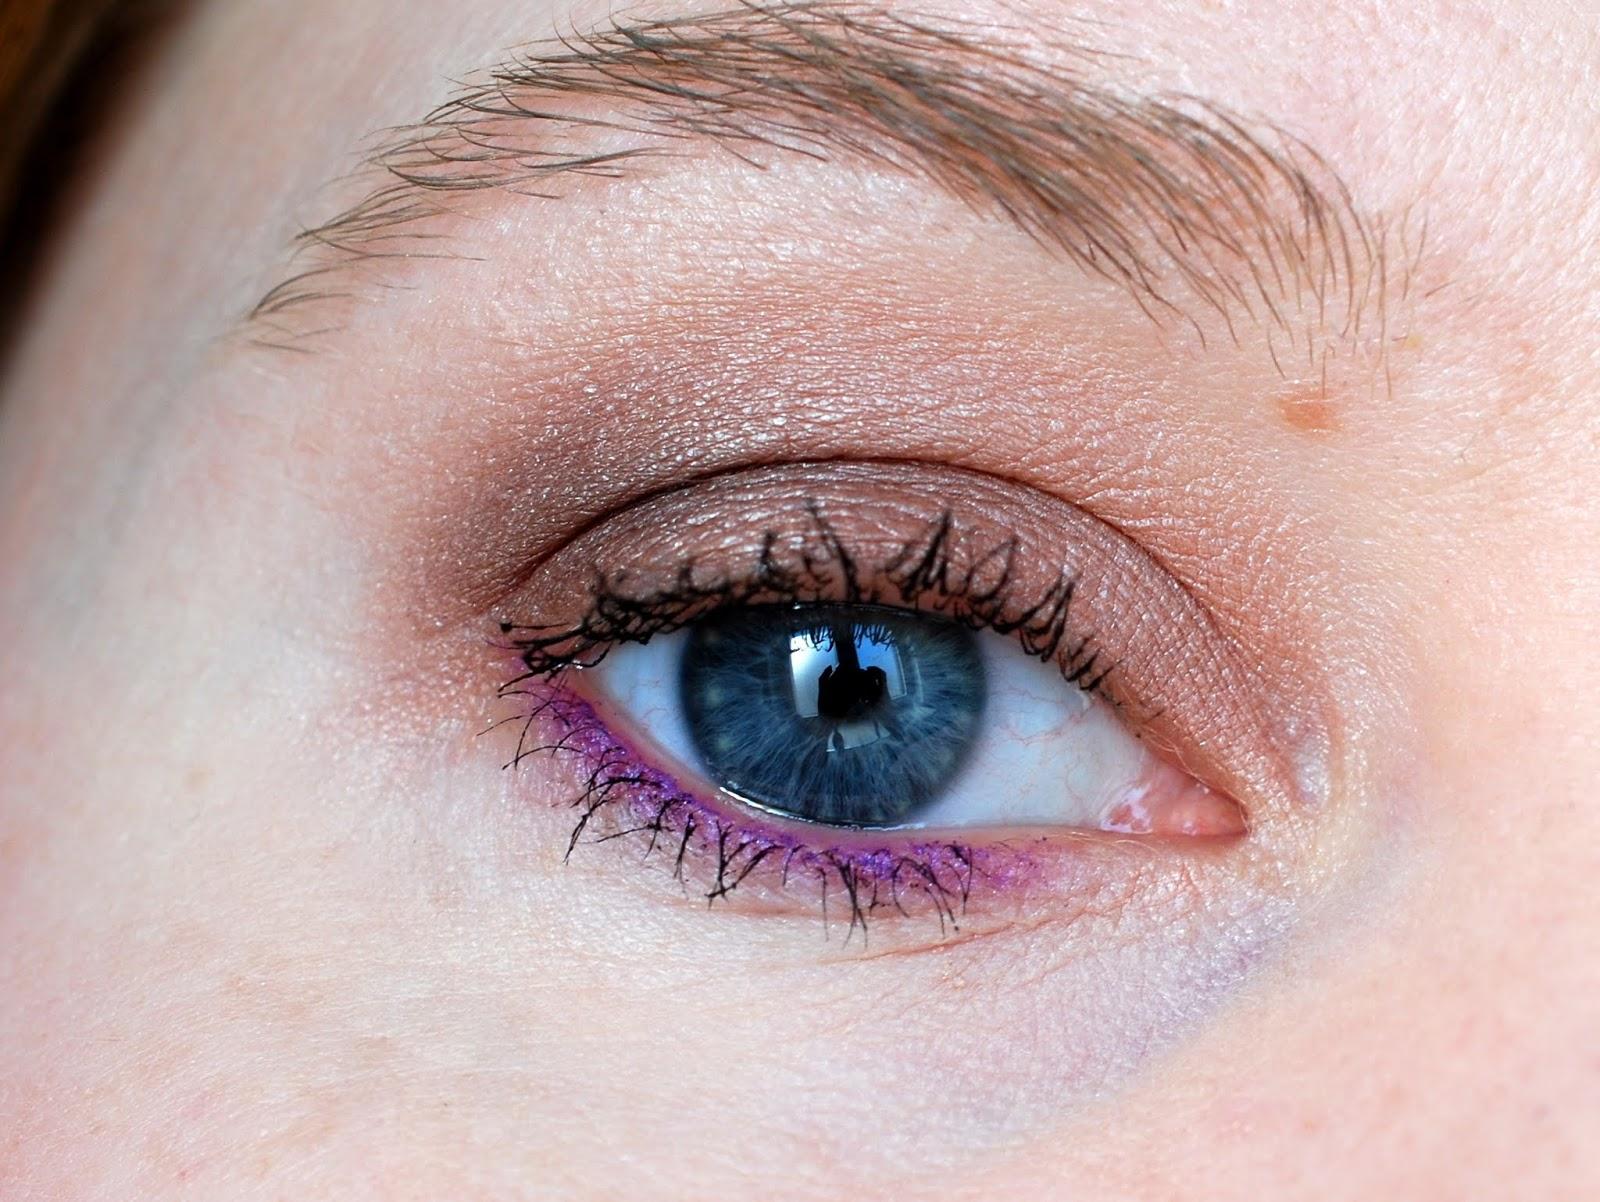 AMU KIKO Sportproof Active Colours Kollektion Orchid Violett Eyeliner und Gradient Brown Lidschatten Infinity Trio